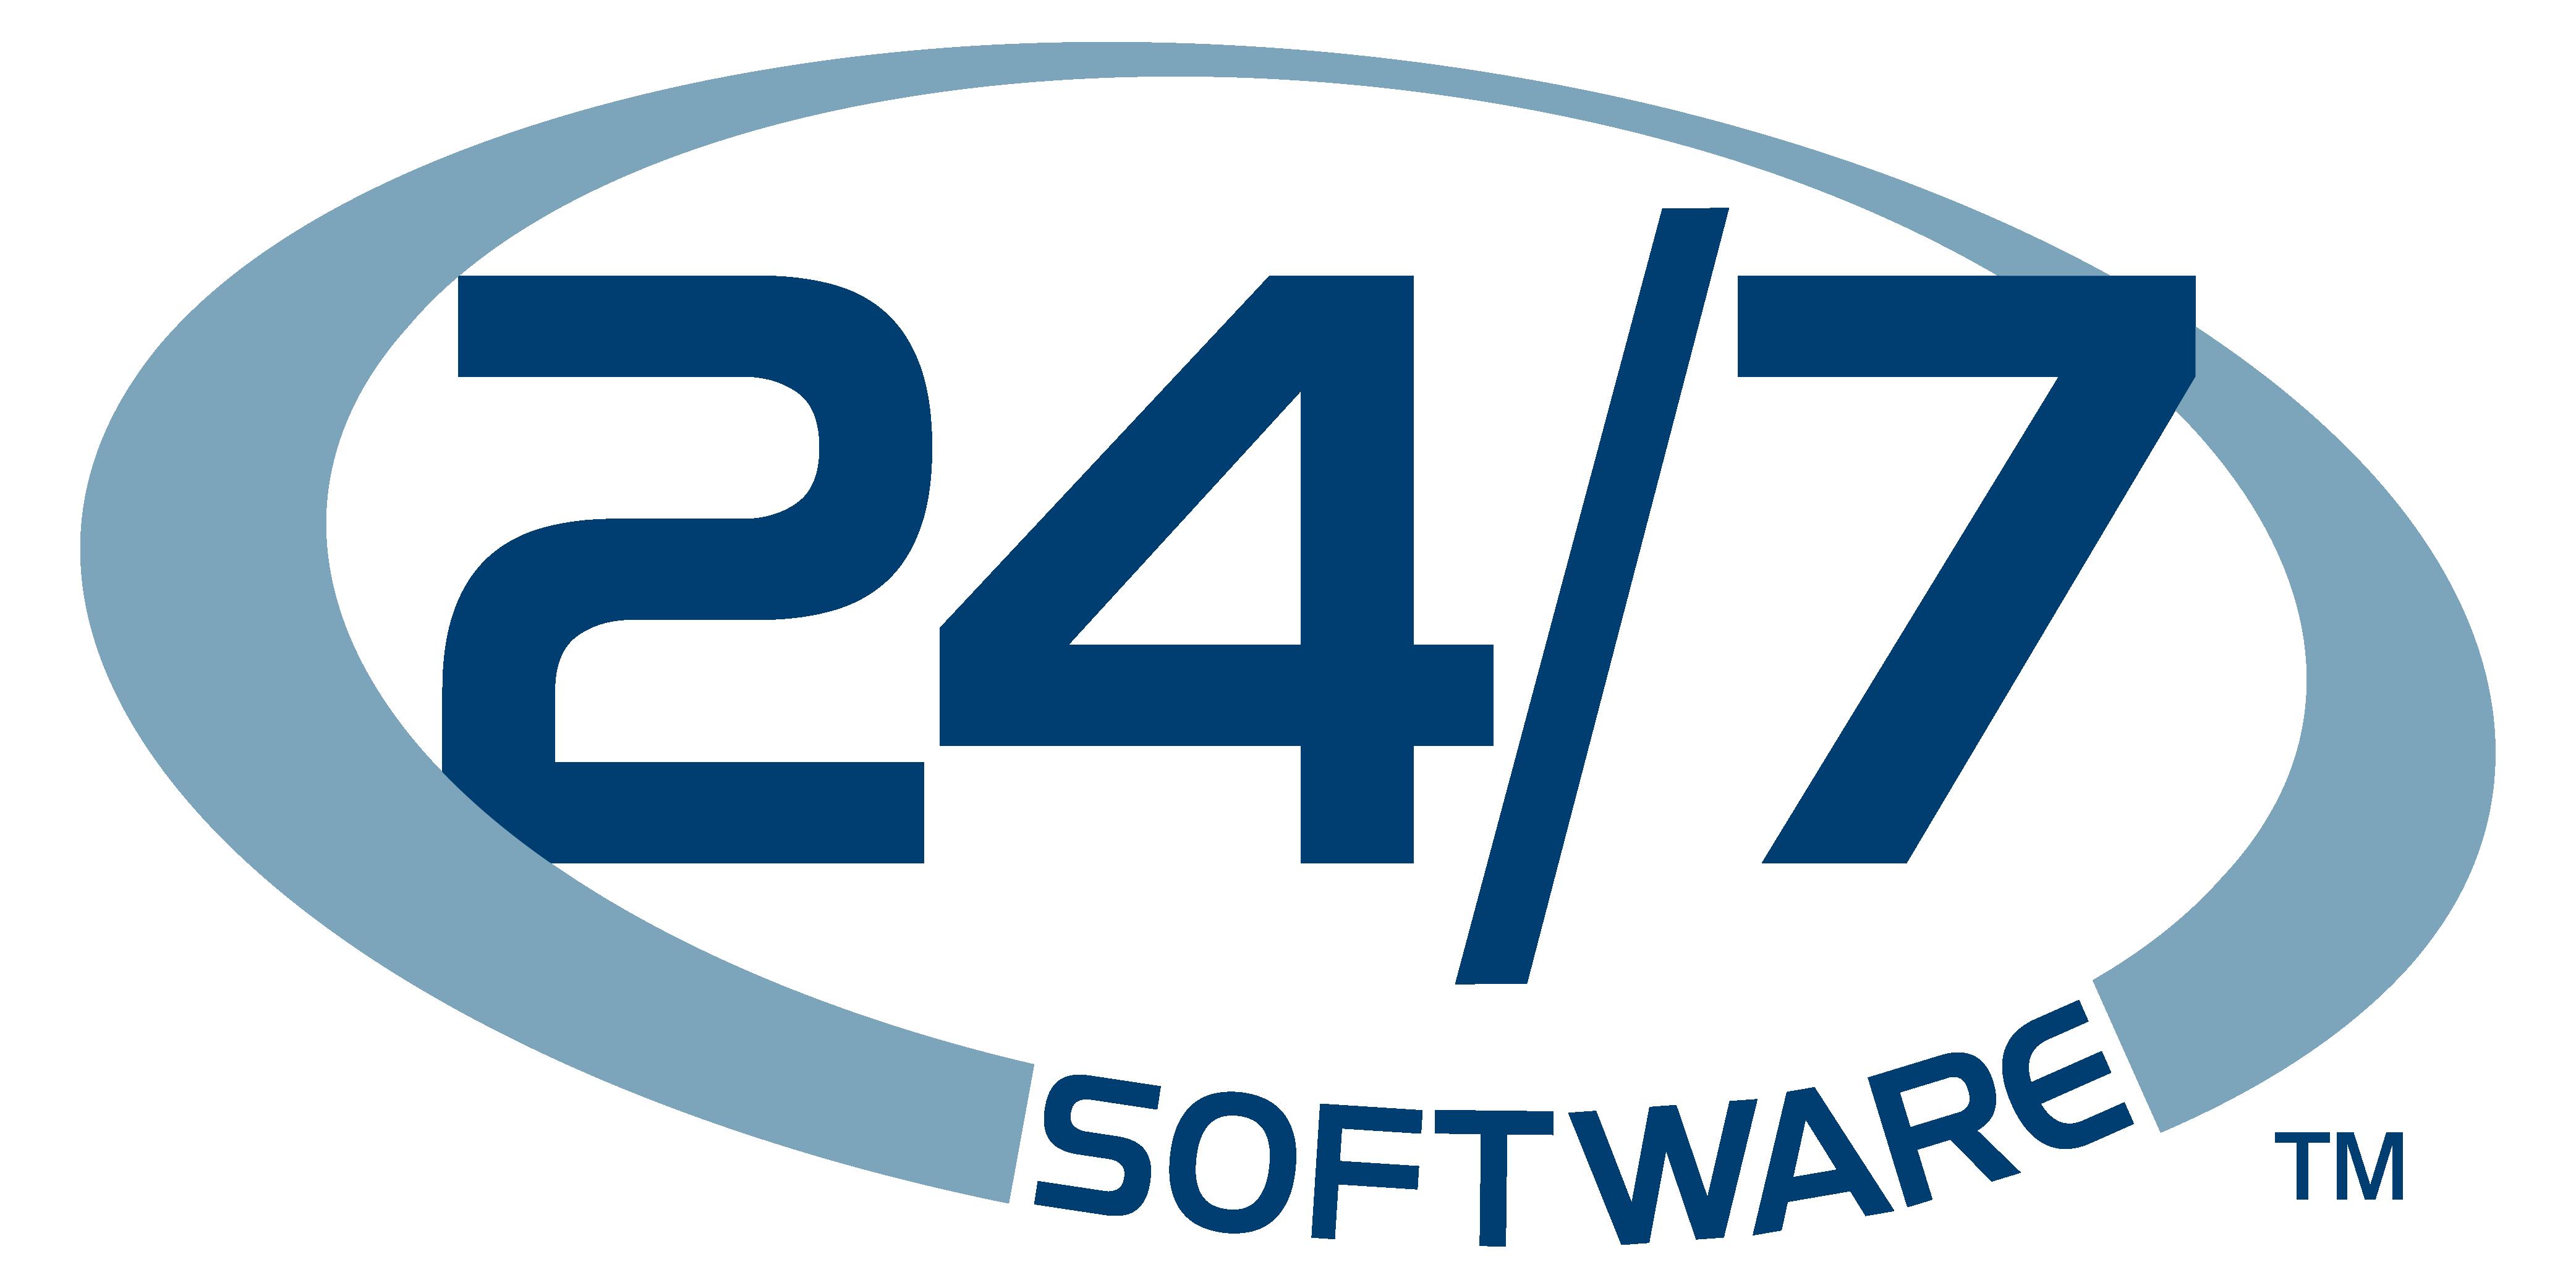 27/7 Software